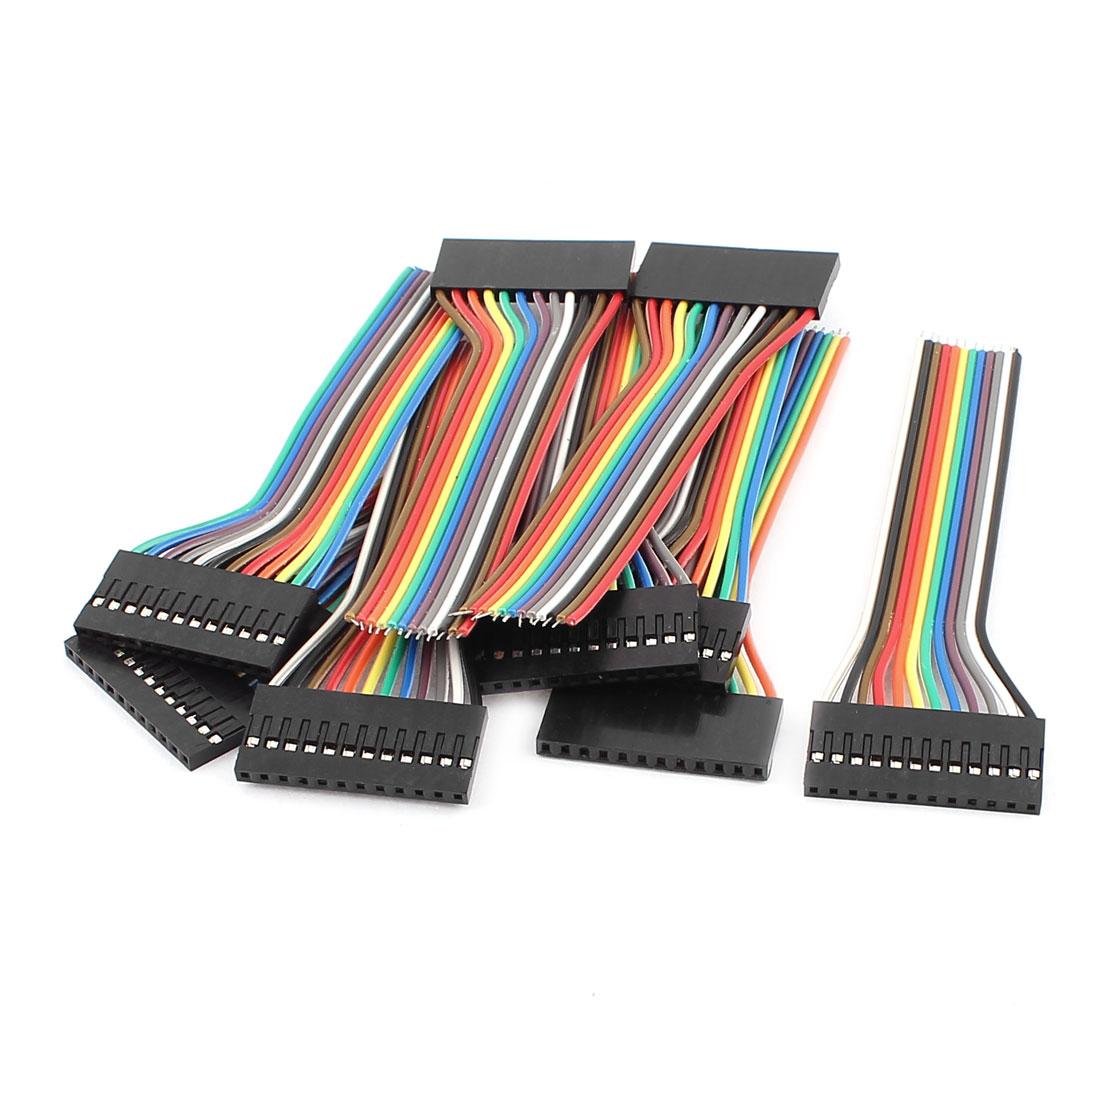 10 Pcs Female 12P Jumper Wires Ribbon Cables Pi Pic Breadboard DIY 10cm Long